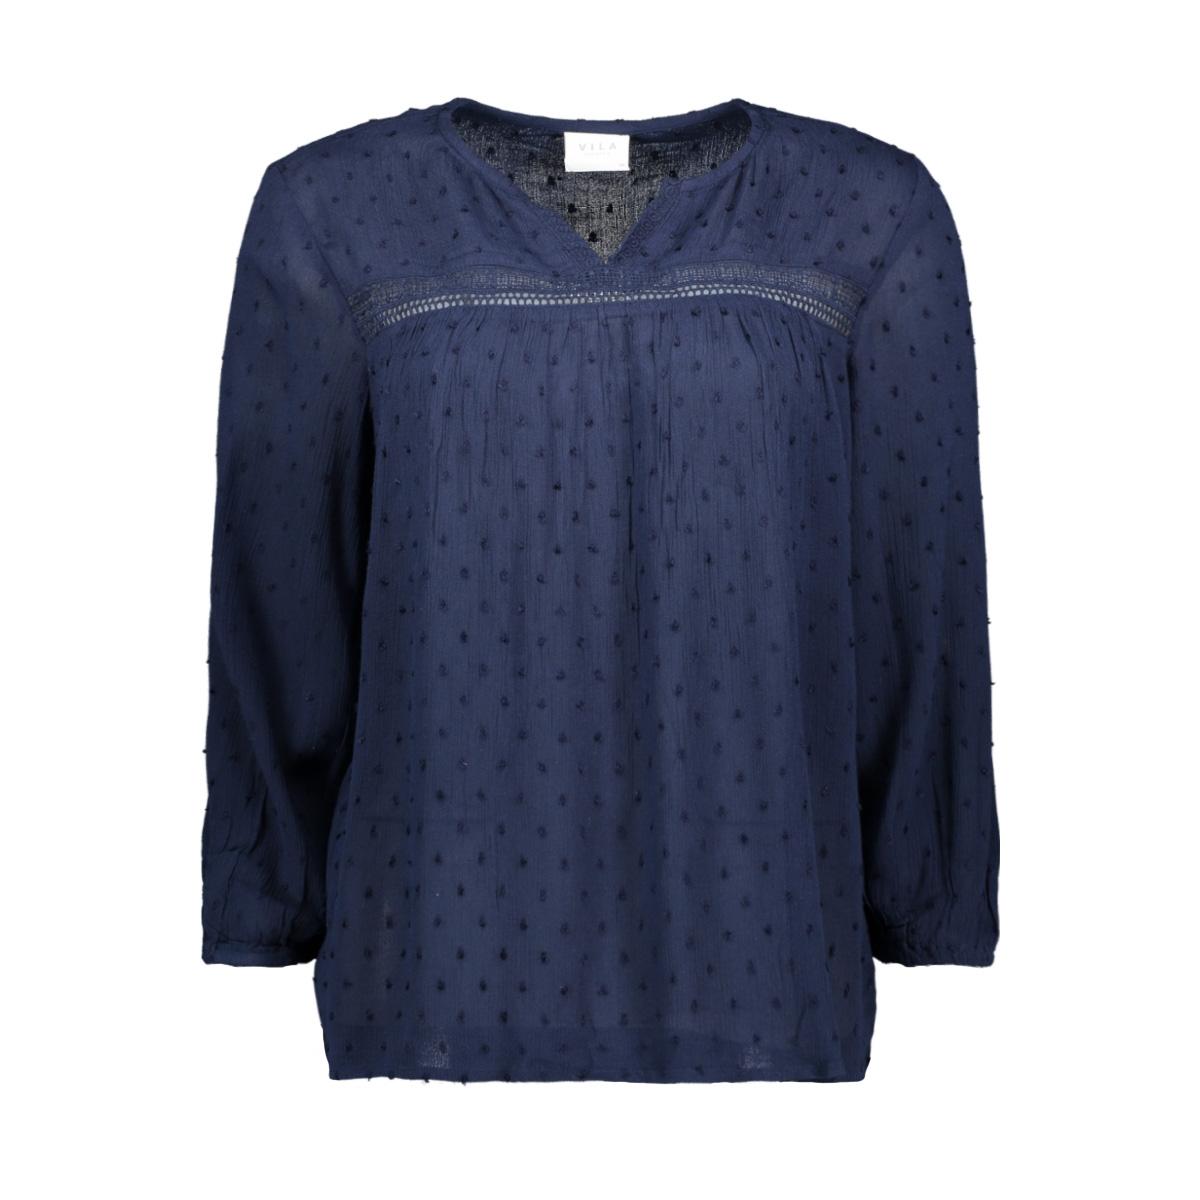 viazolla 3/4 top 14057743 vila blouse navy blazer